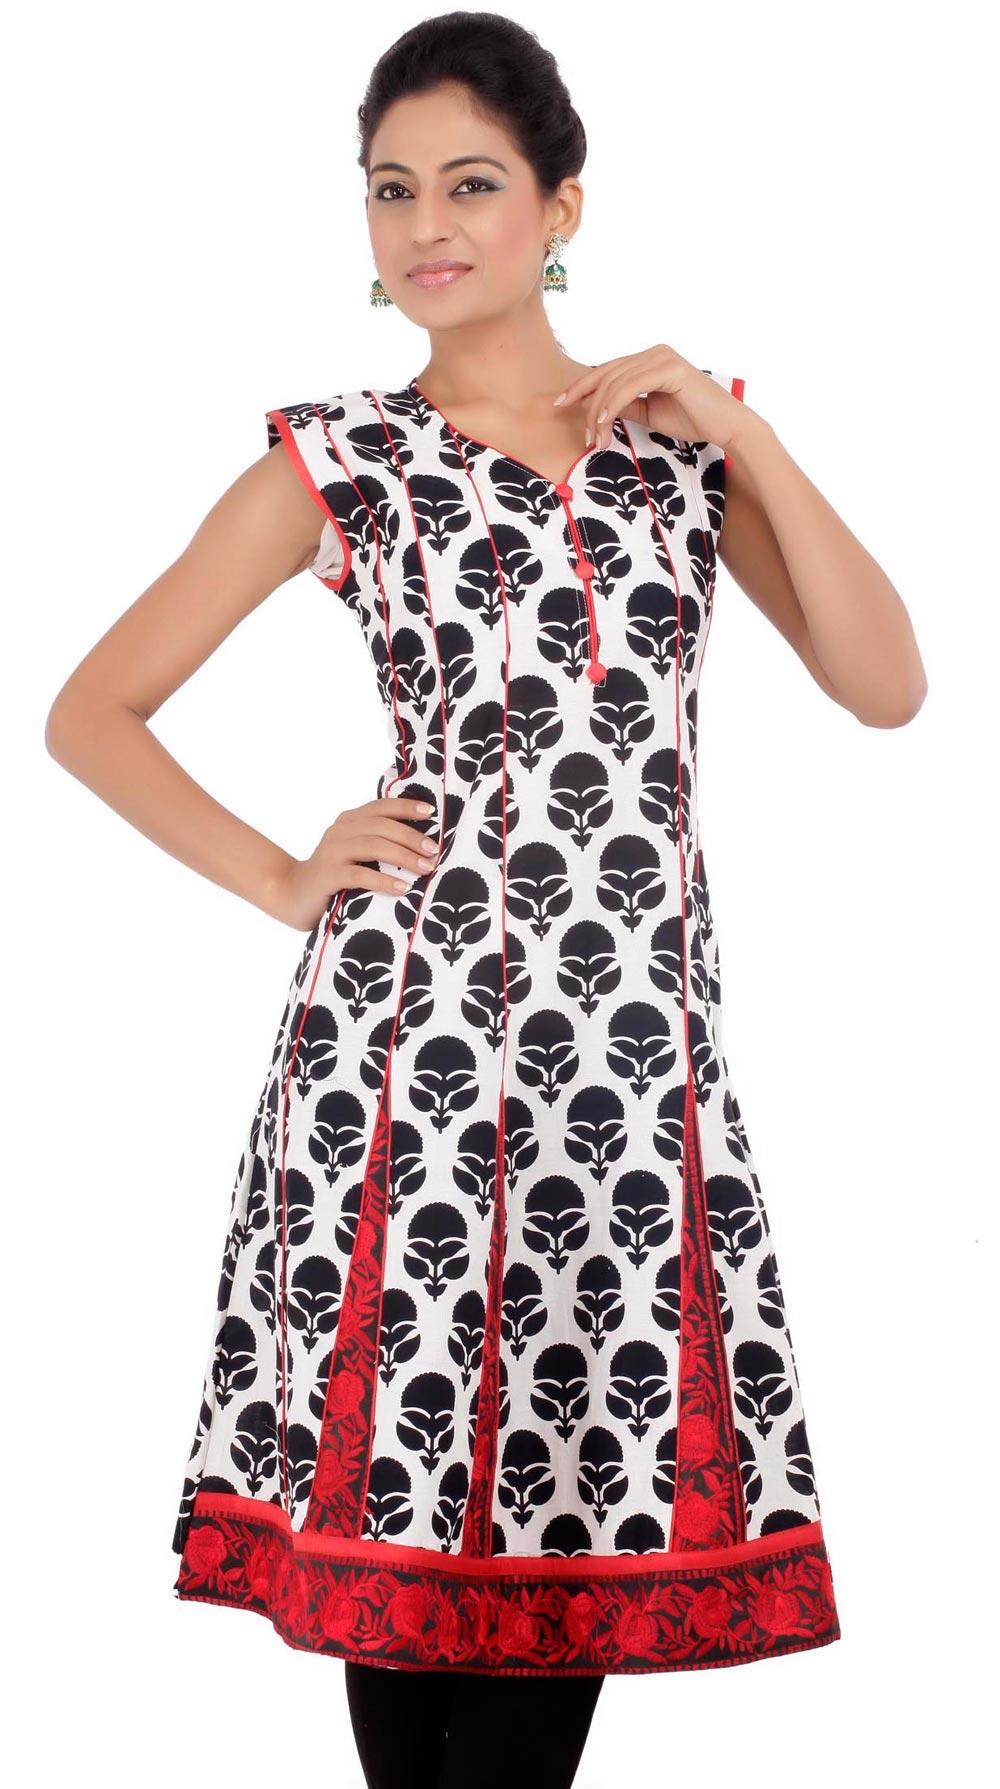 Shirt ke design - Latest Women Cotton Shirts And Kurti Designs For Spring Summer 3